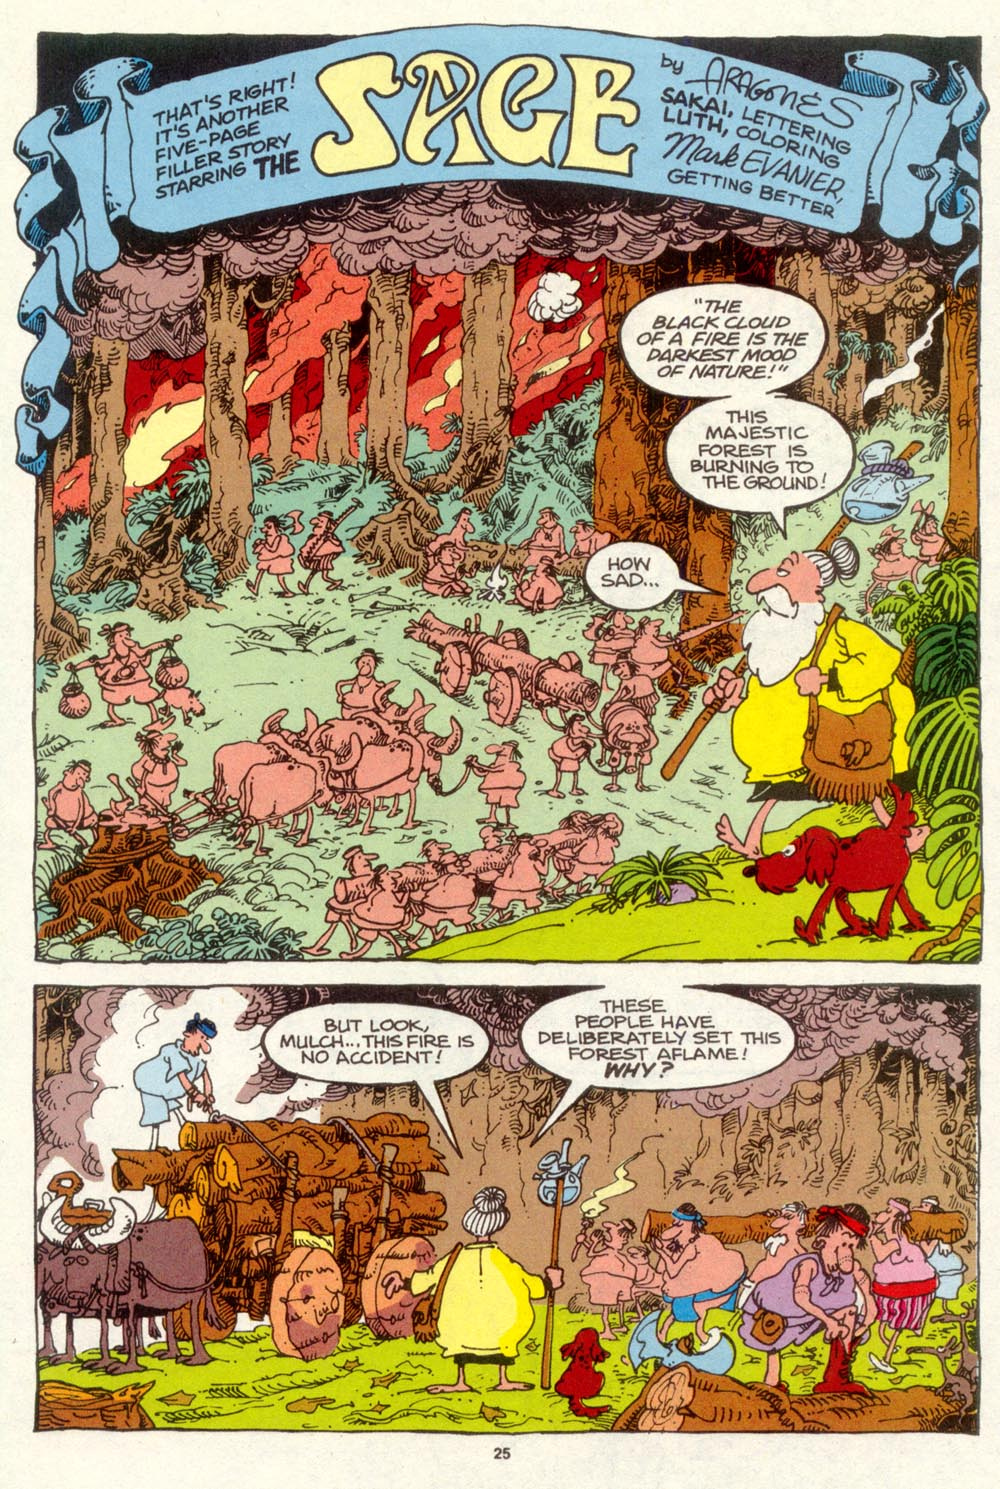 Read online Sergio Aragonés Groo the Wanderer comic -  Issue #93 - 26